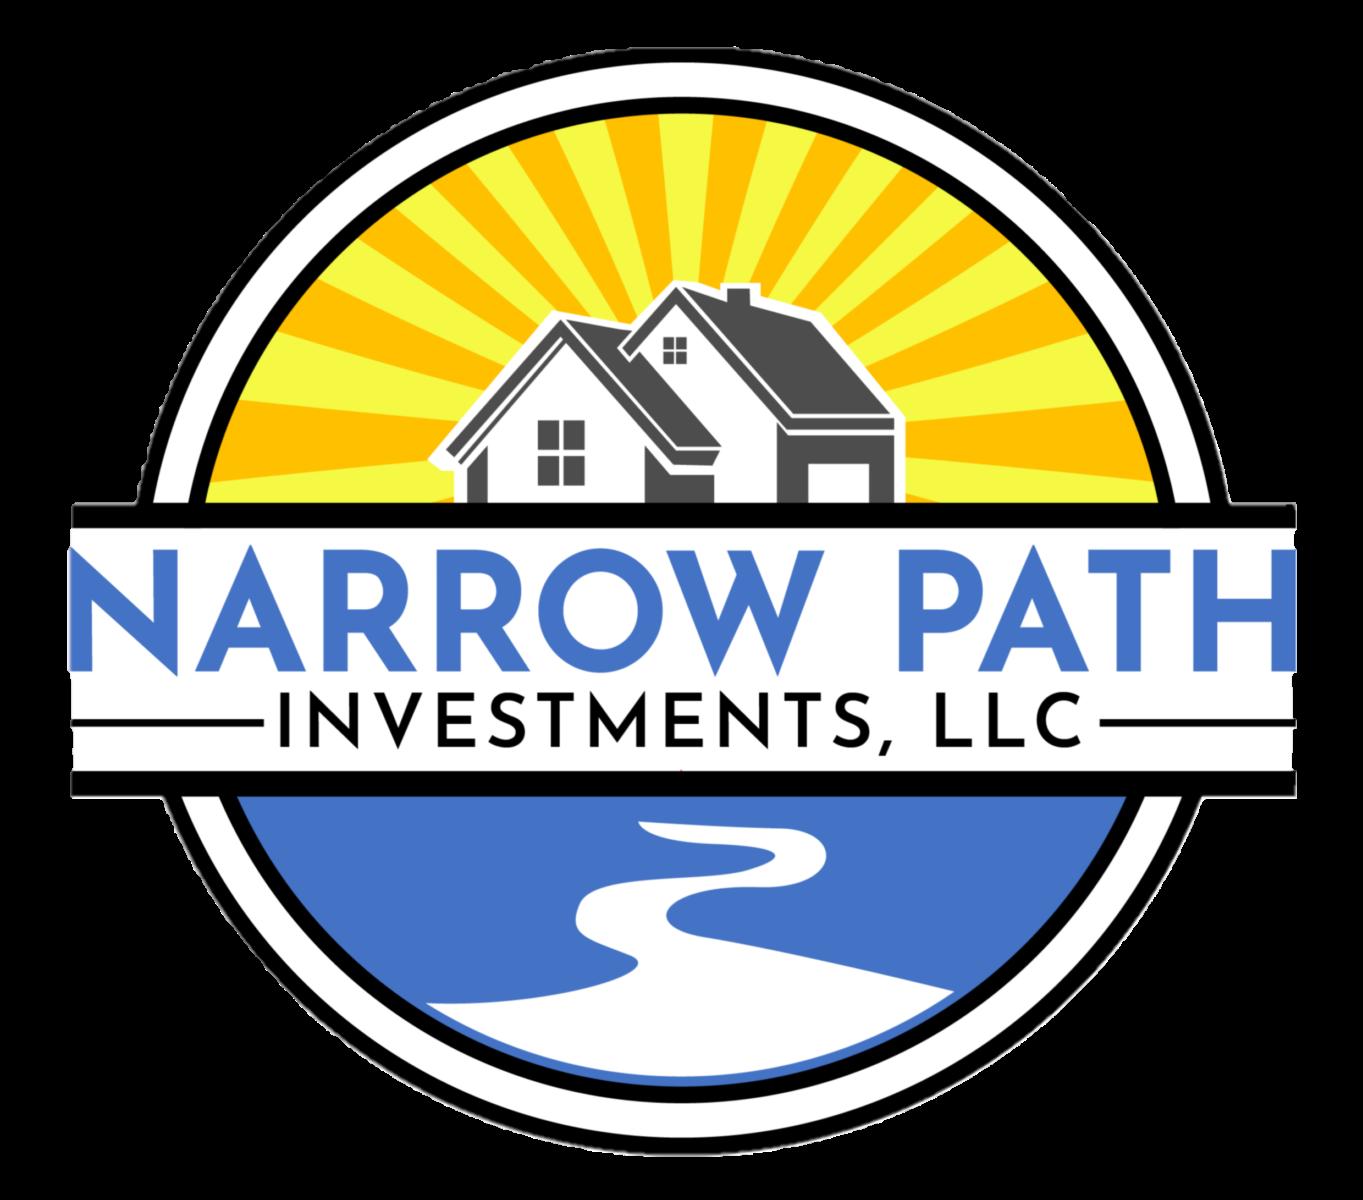 Narrow Path Investments, LLC  logo